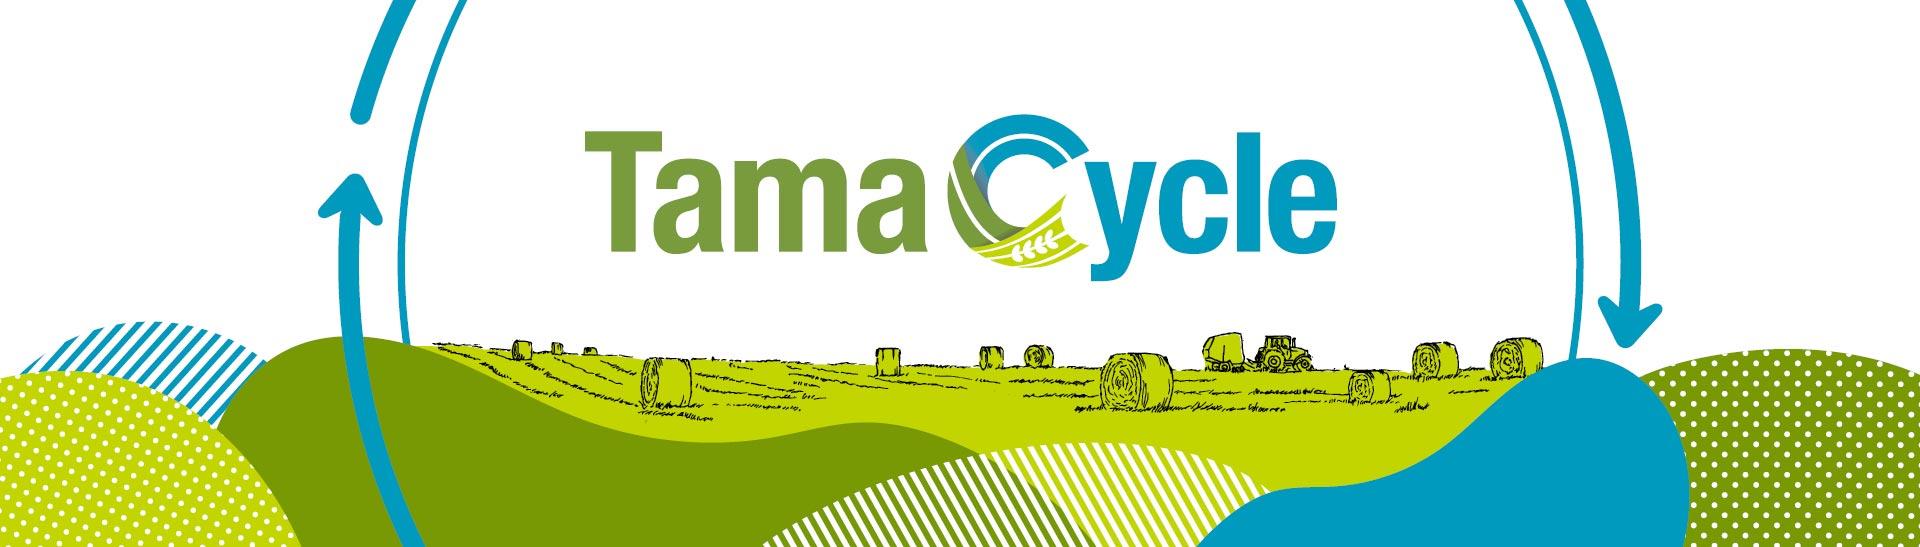 TamaNet Cycle Banner